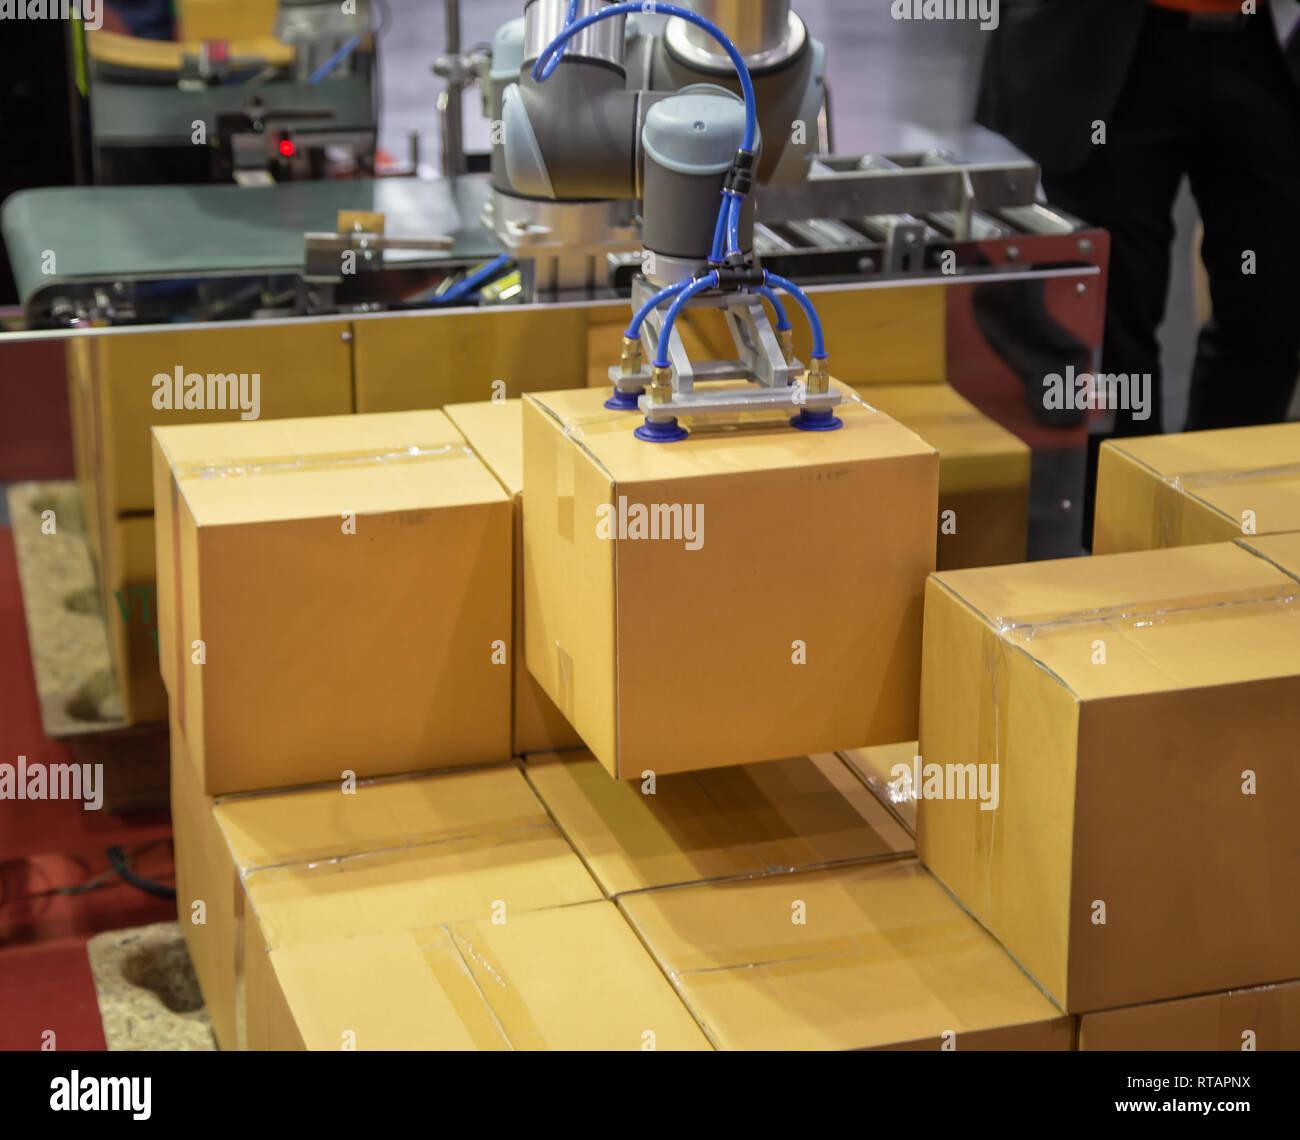 The universal robot lifting carton to production line - Stock Image